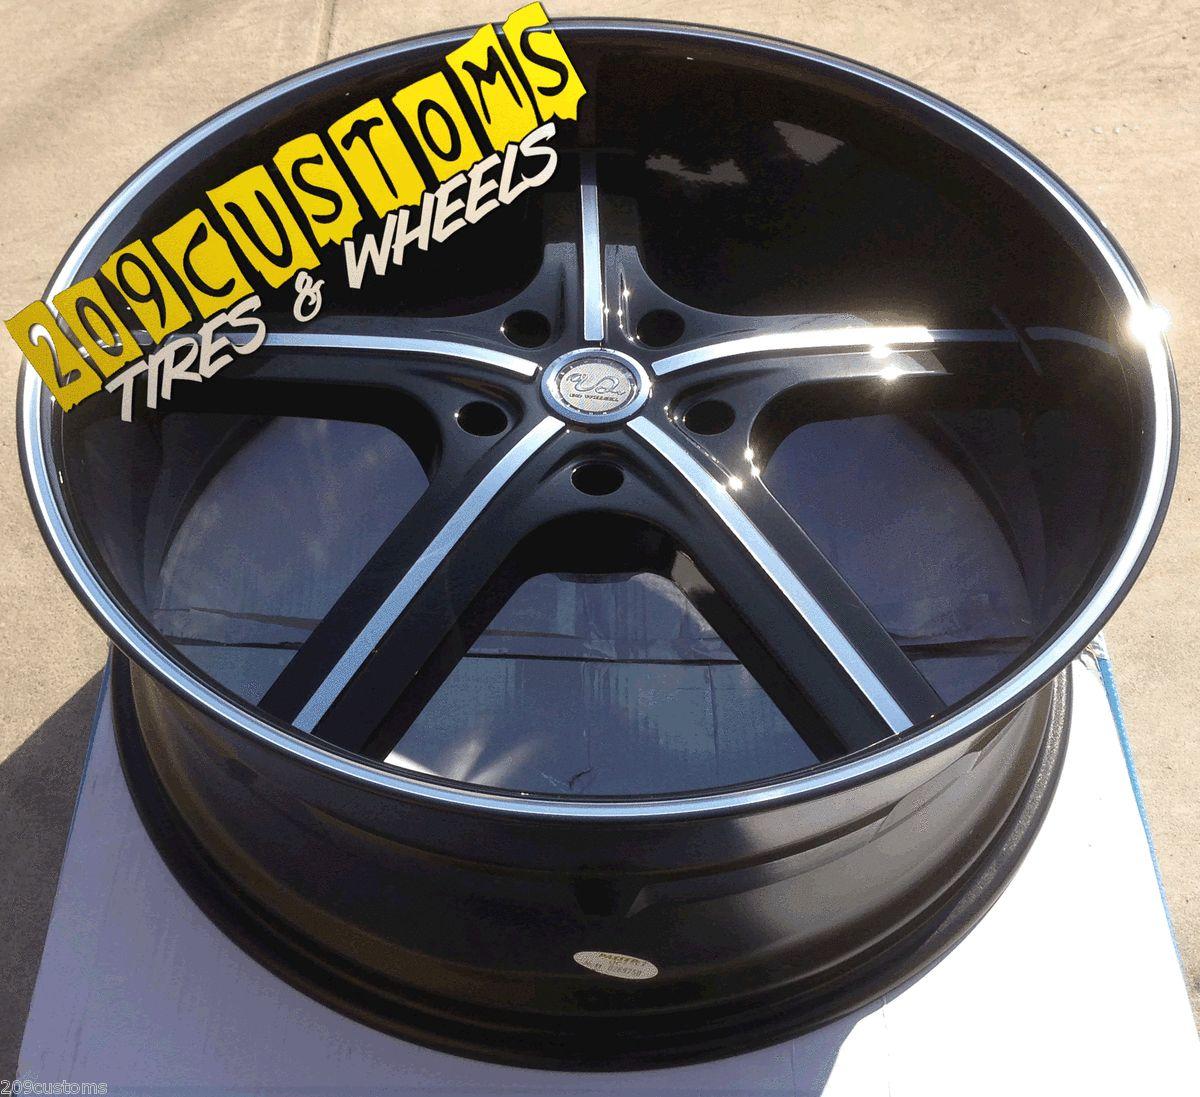 22 U2W55 Black Wheels Tires Rims 5x115 Charger Magnum Nitro